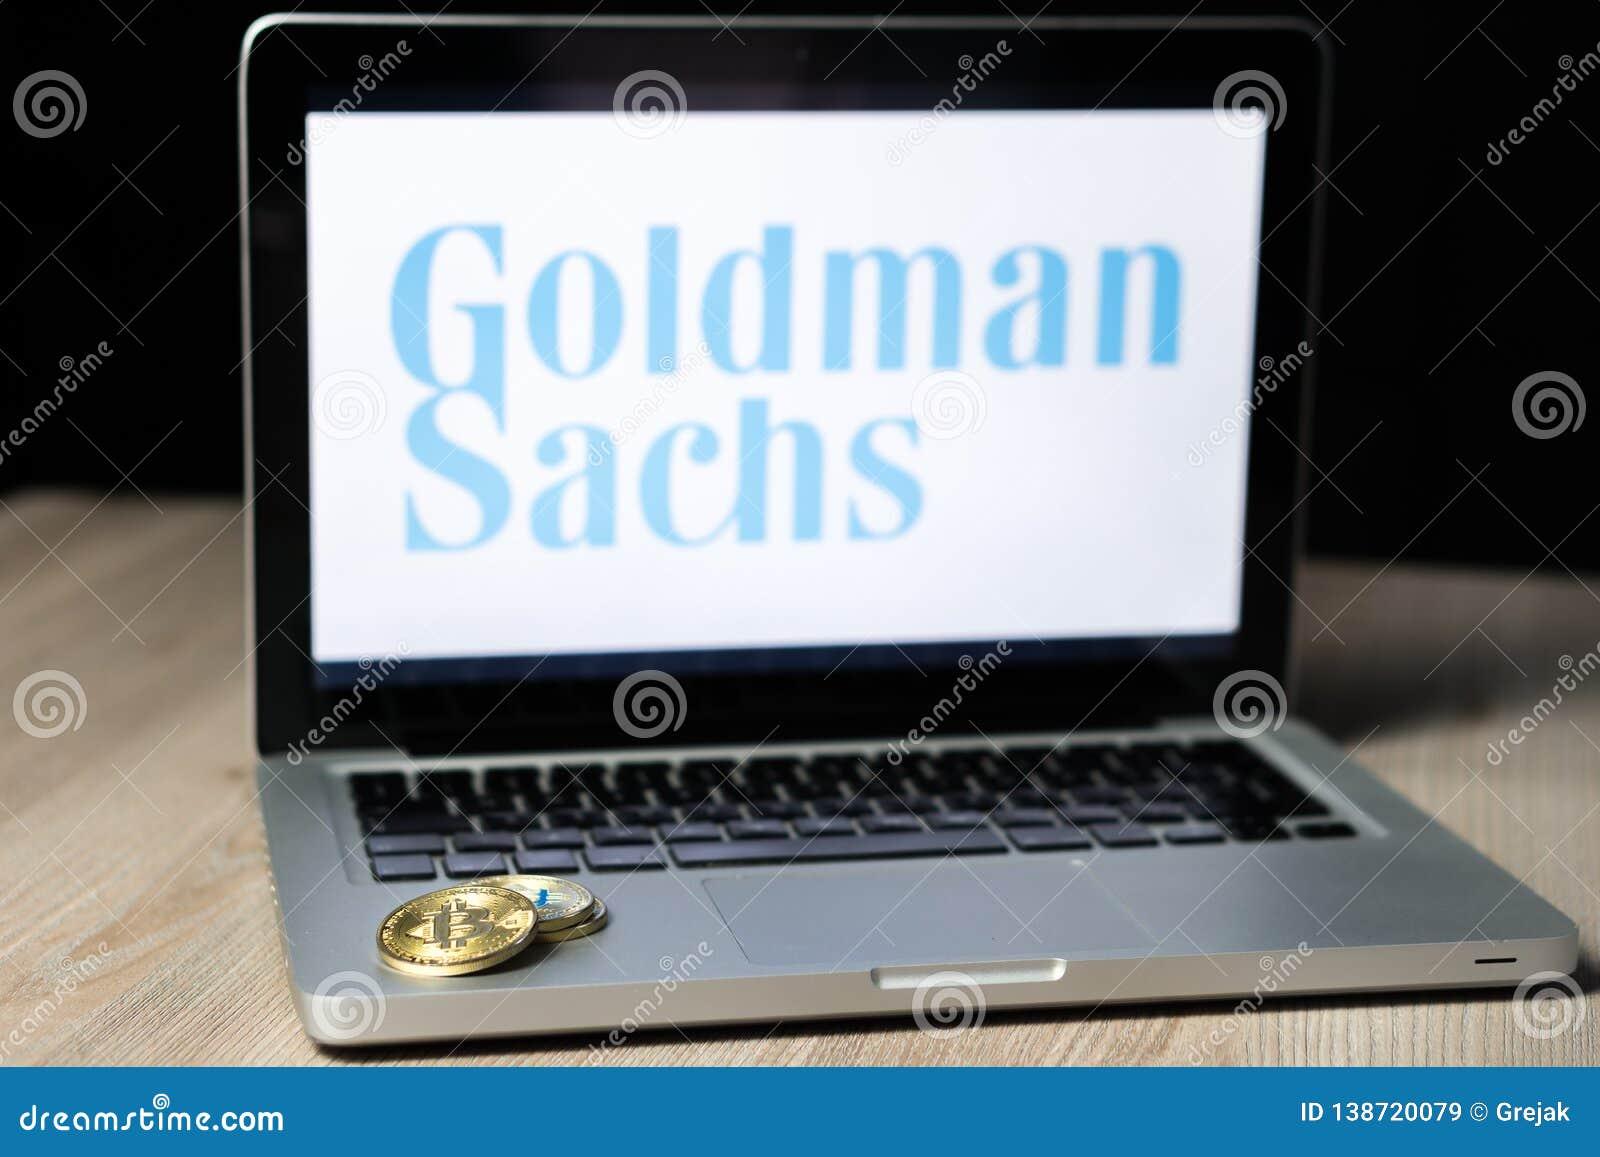 Bitcoin moneta Slovenia, Grudzień z Goldman sachs logo na laptopu ekranie, - 23th, 2018